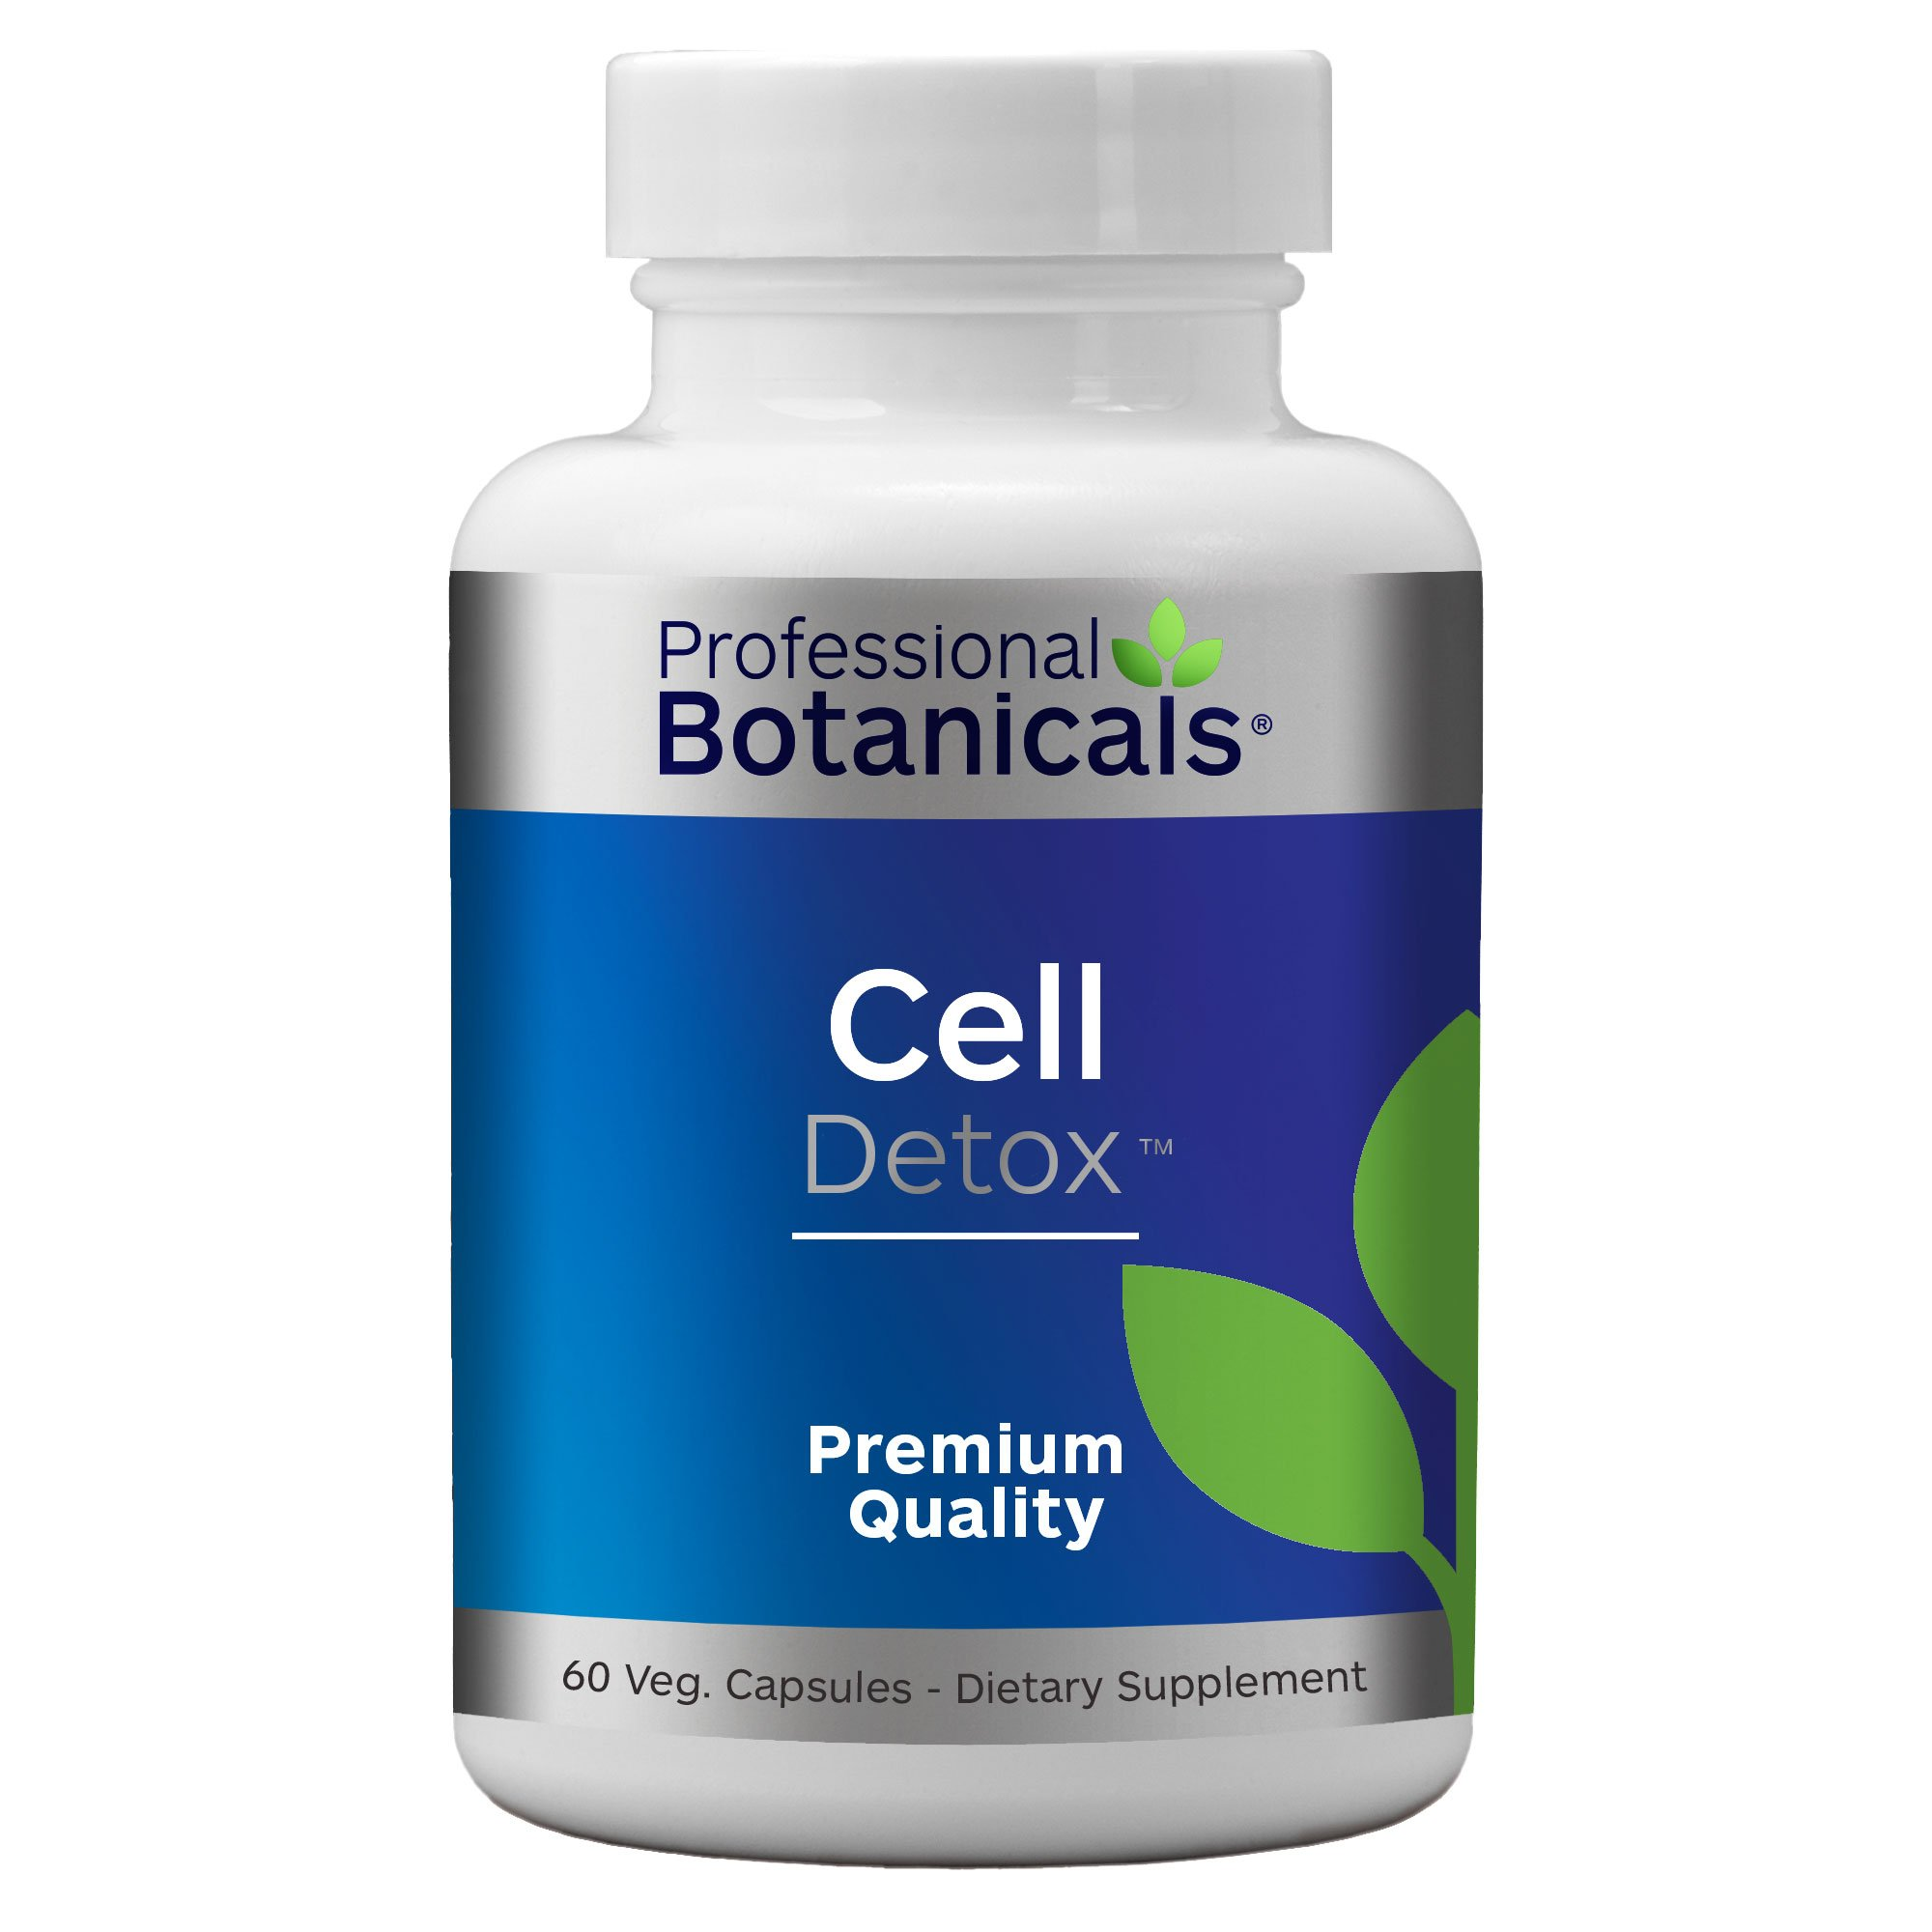 Professional Botanicals Cell Detox Vegan Cell Cleansing & Detoxification Supplement - 60 Veg Capsules